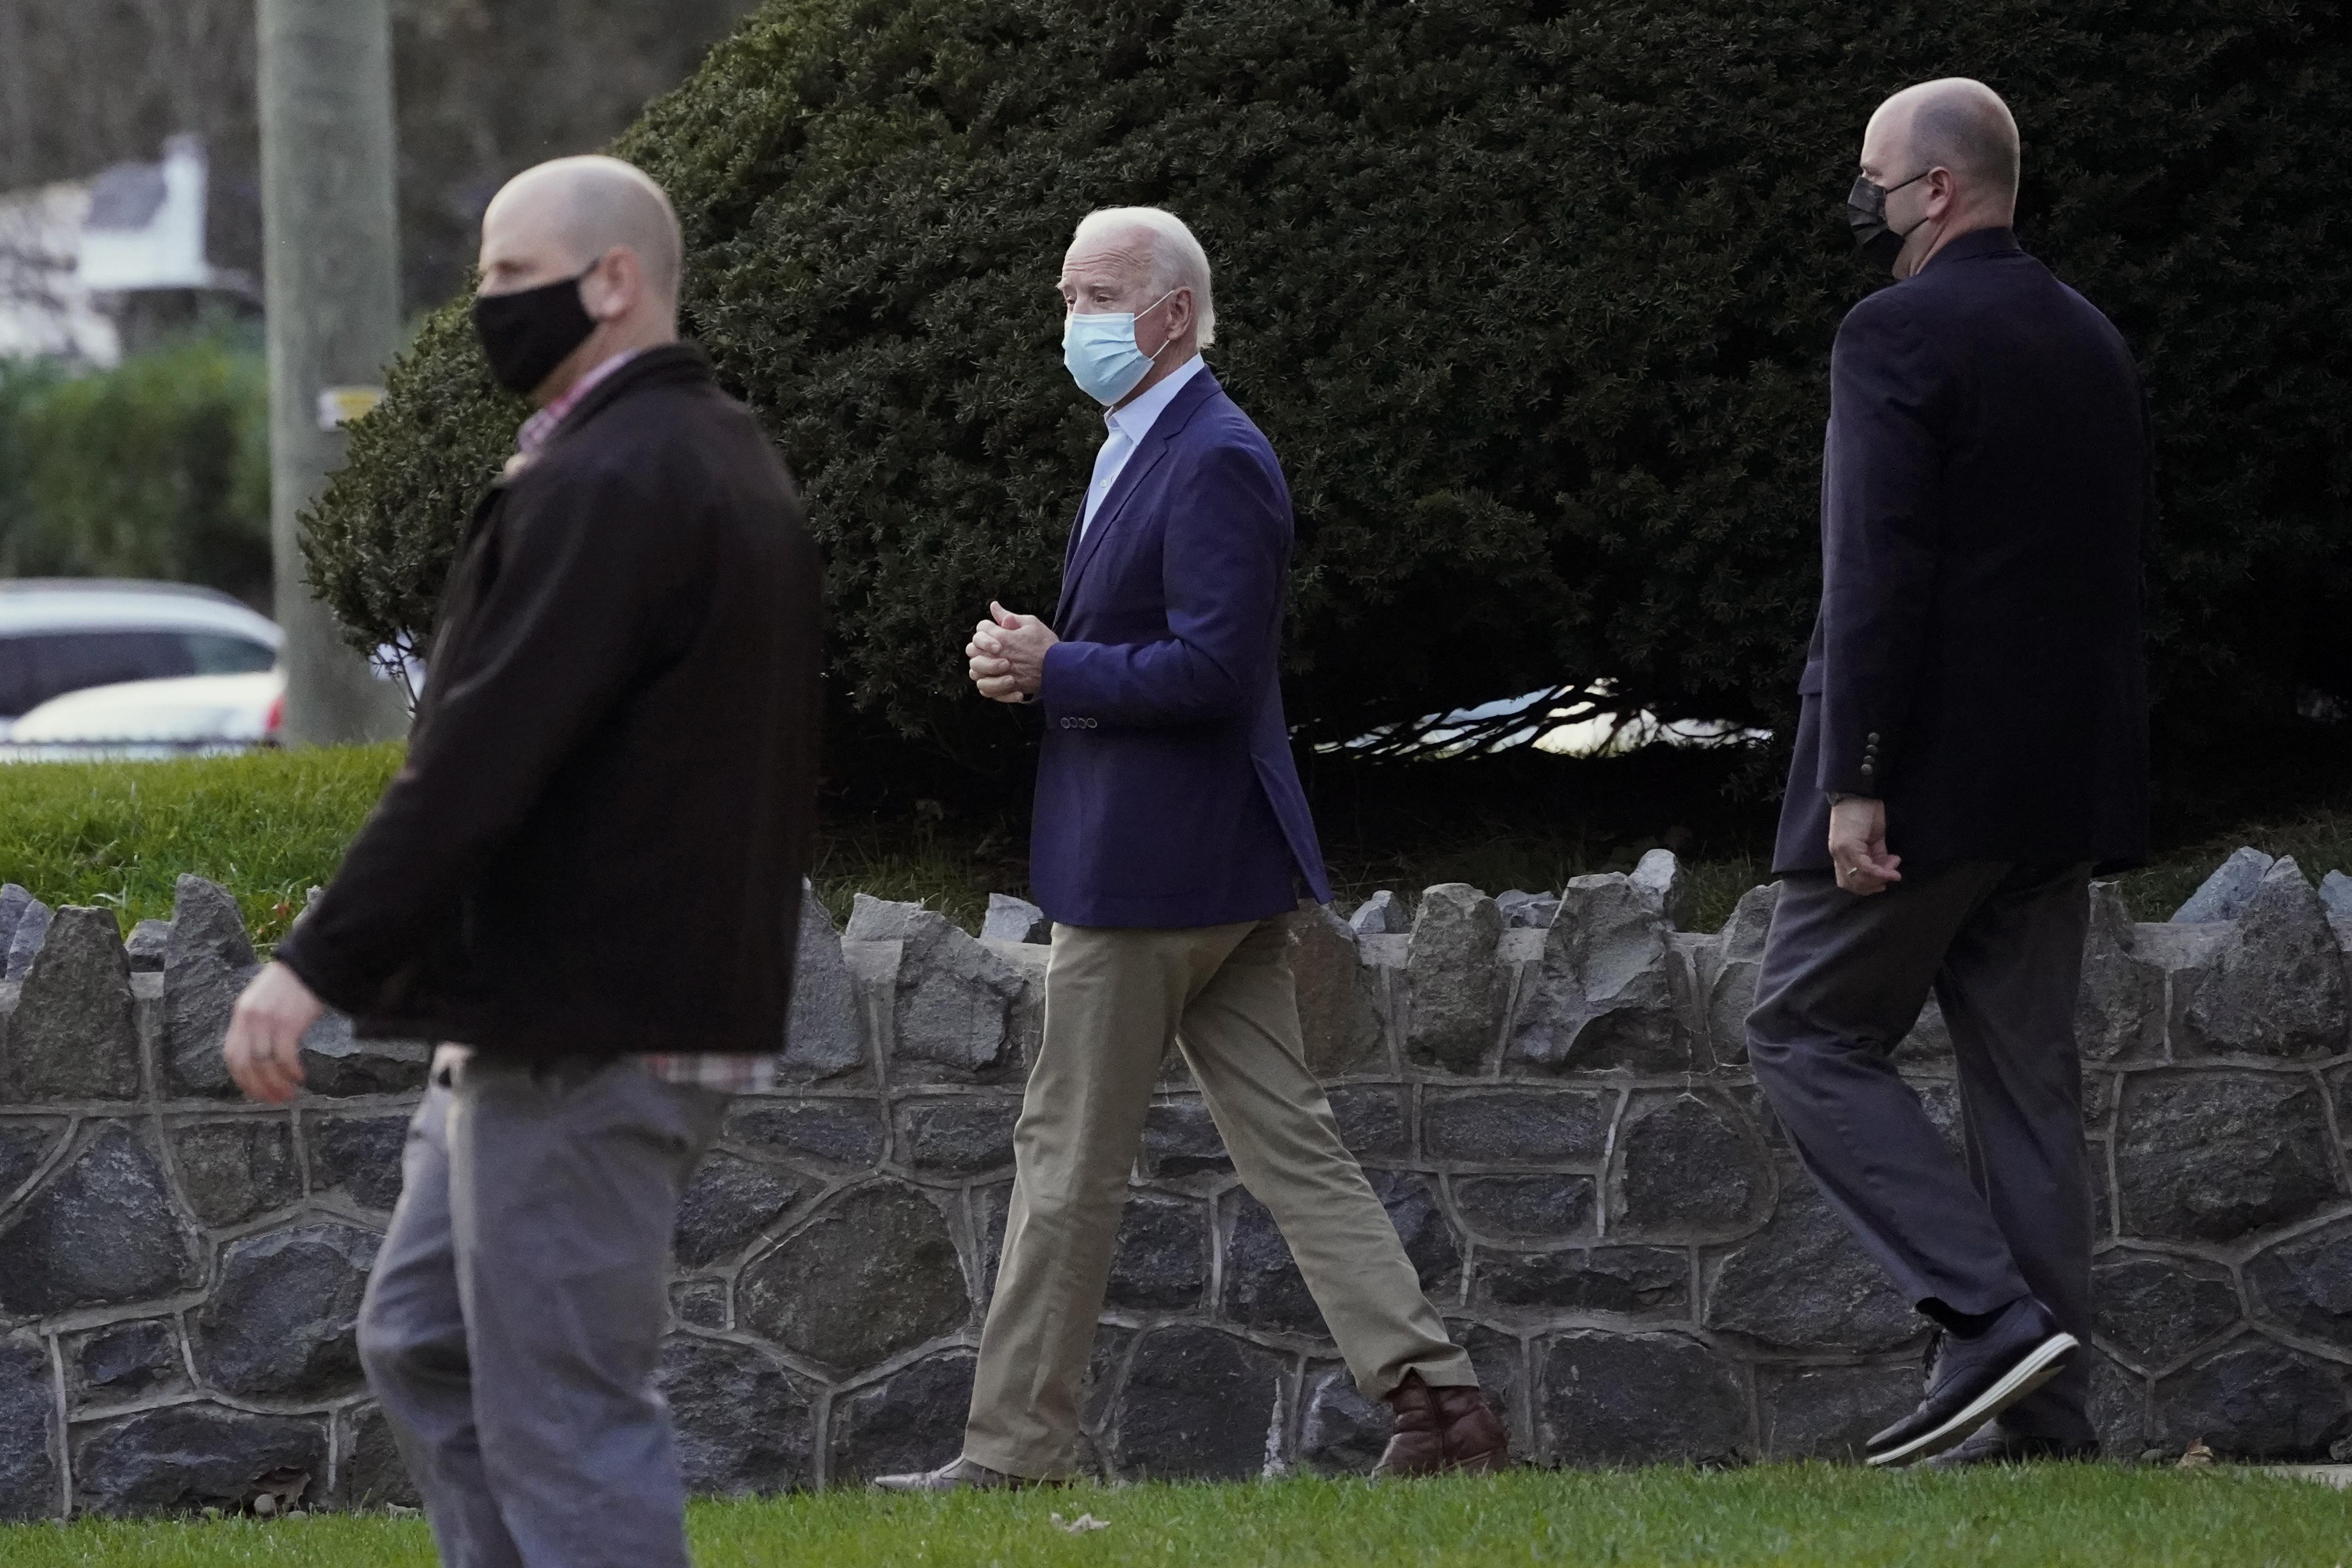 President-elect Joe Biden leaves St. Ann Parish in Wilmington, Del., on Nov. 21, 2020.